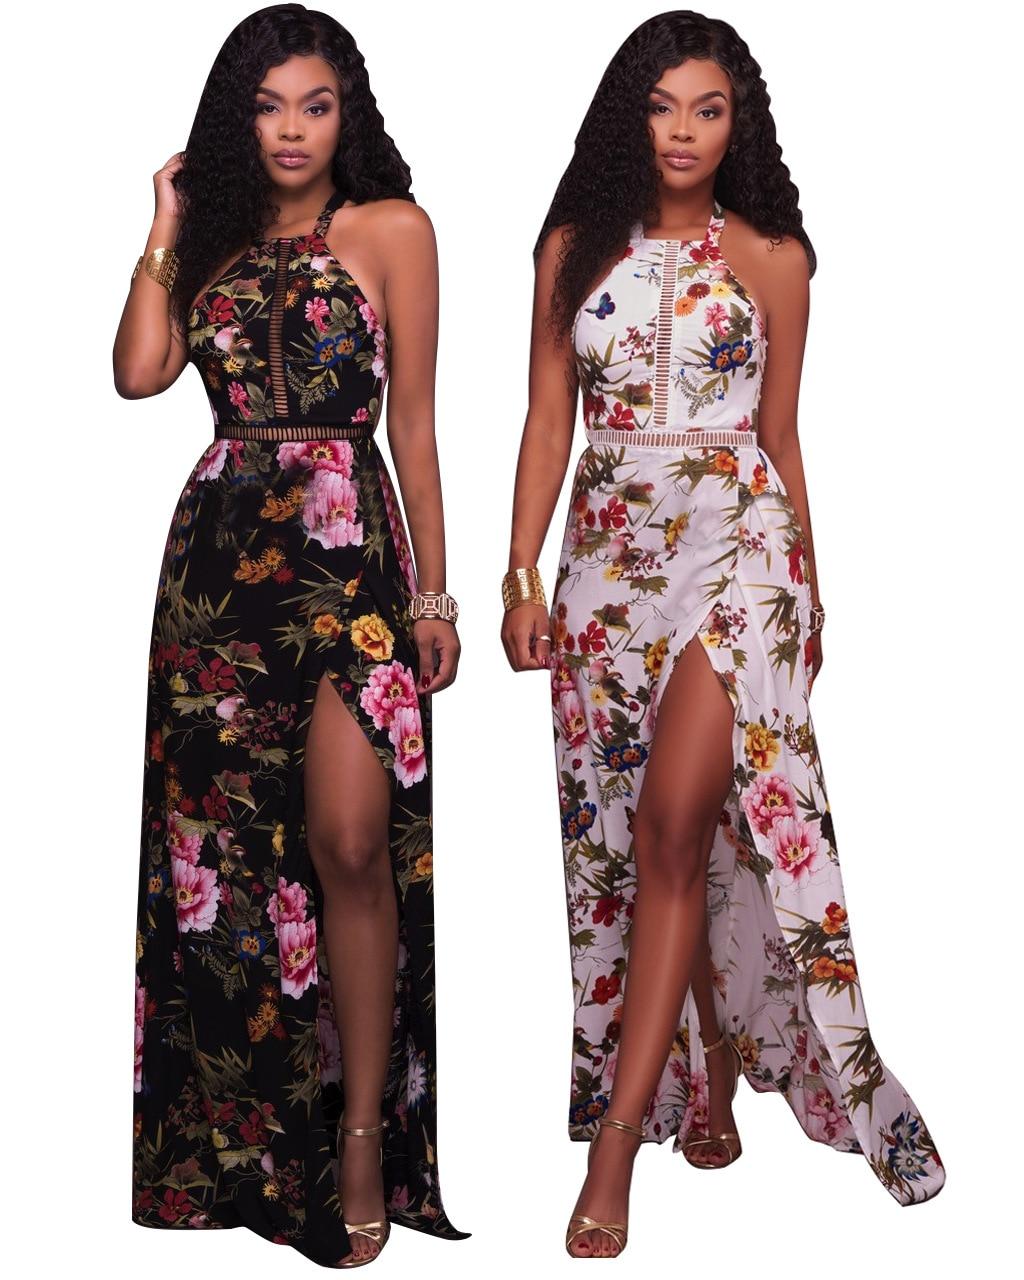 149ed73d743 2017 Flower Printing Halt Sexy Beach Maxi Dress Summer Holiday Dress ...